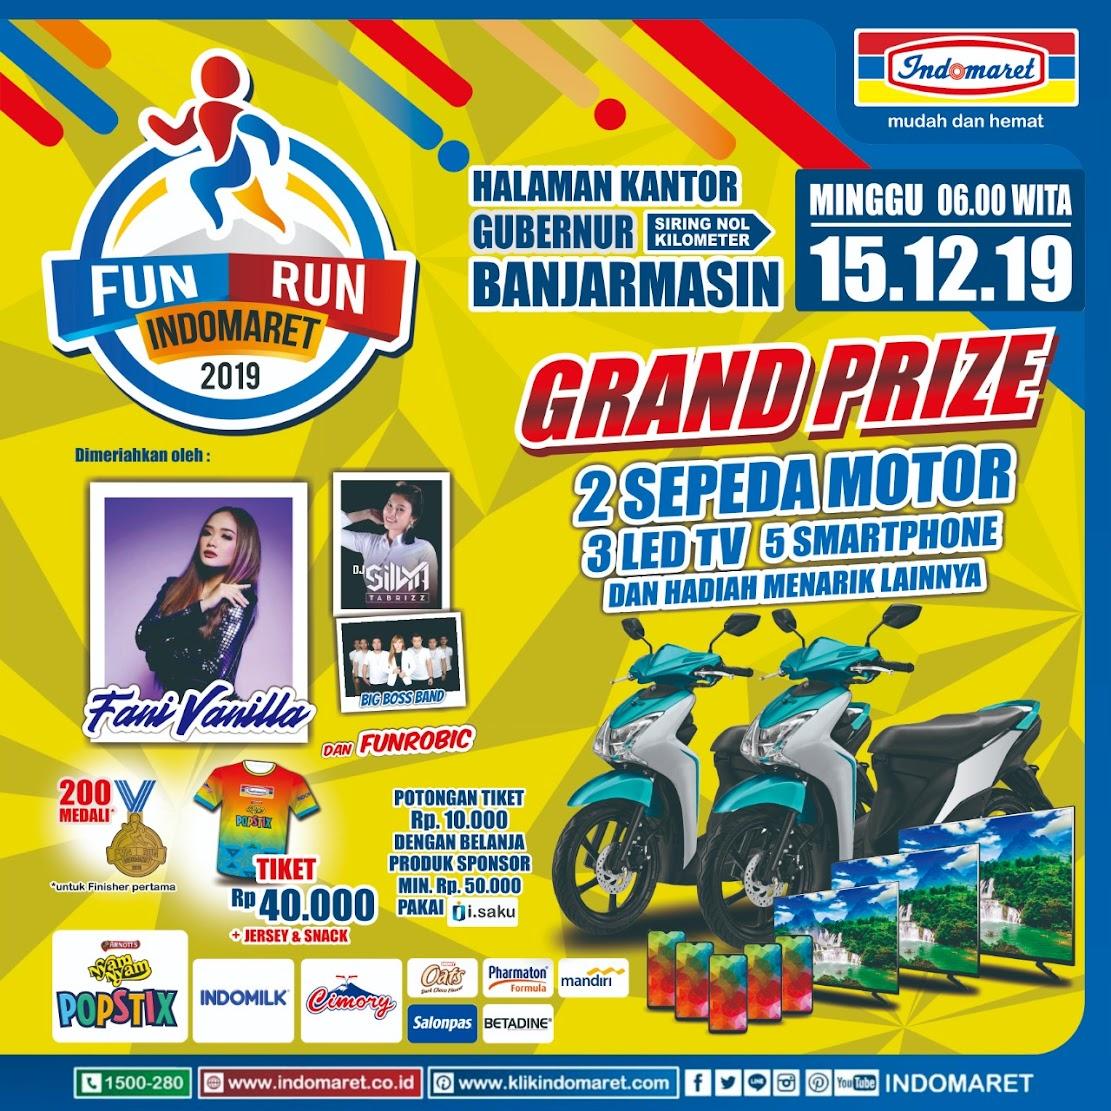 Fun Run Indomaret - Banjarmasin • 2019